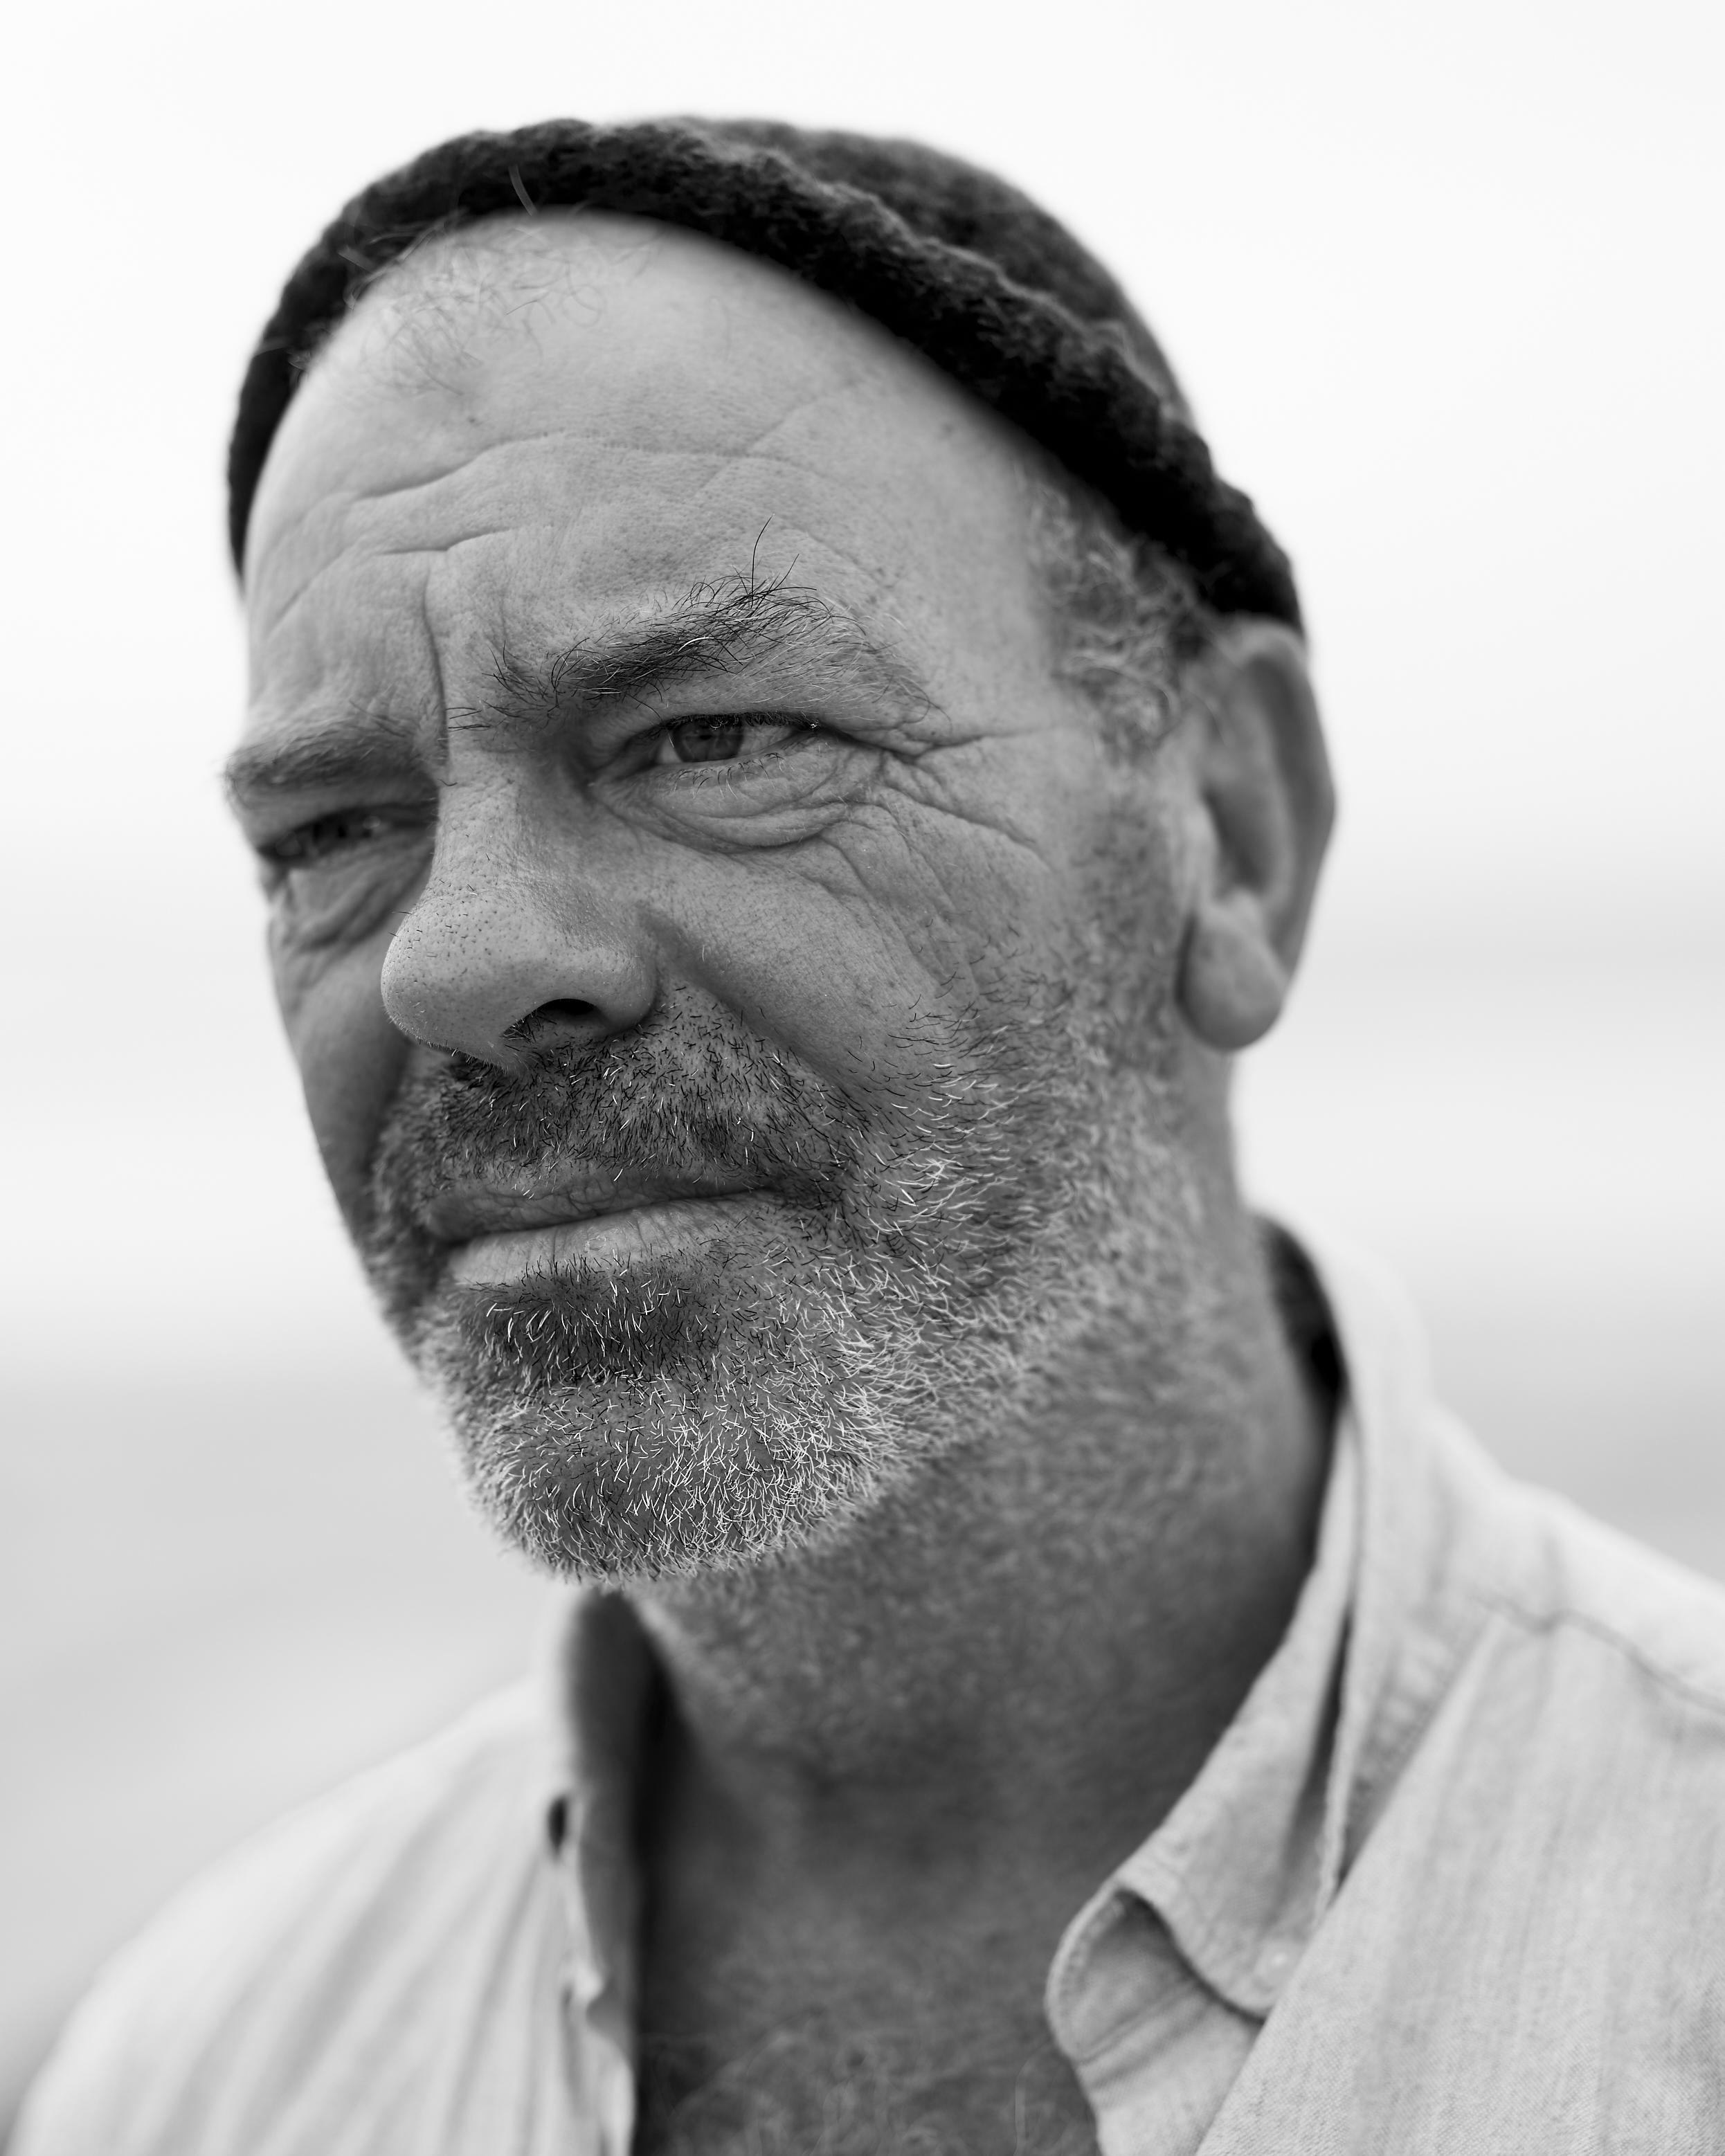 Steve Bateman, A true 'Guern', fisherman, doorman, labourer, chef and all round character, photographed off Vazon beach, Guernsey